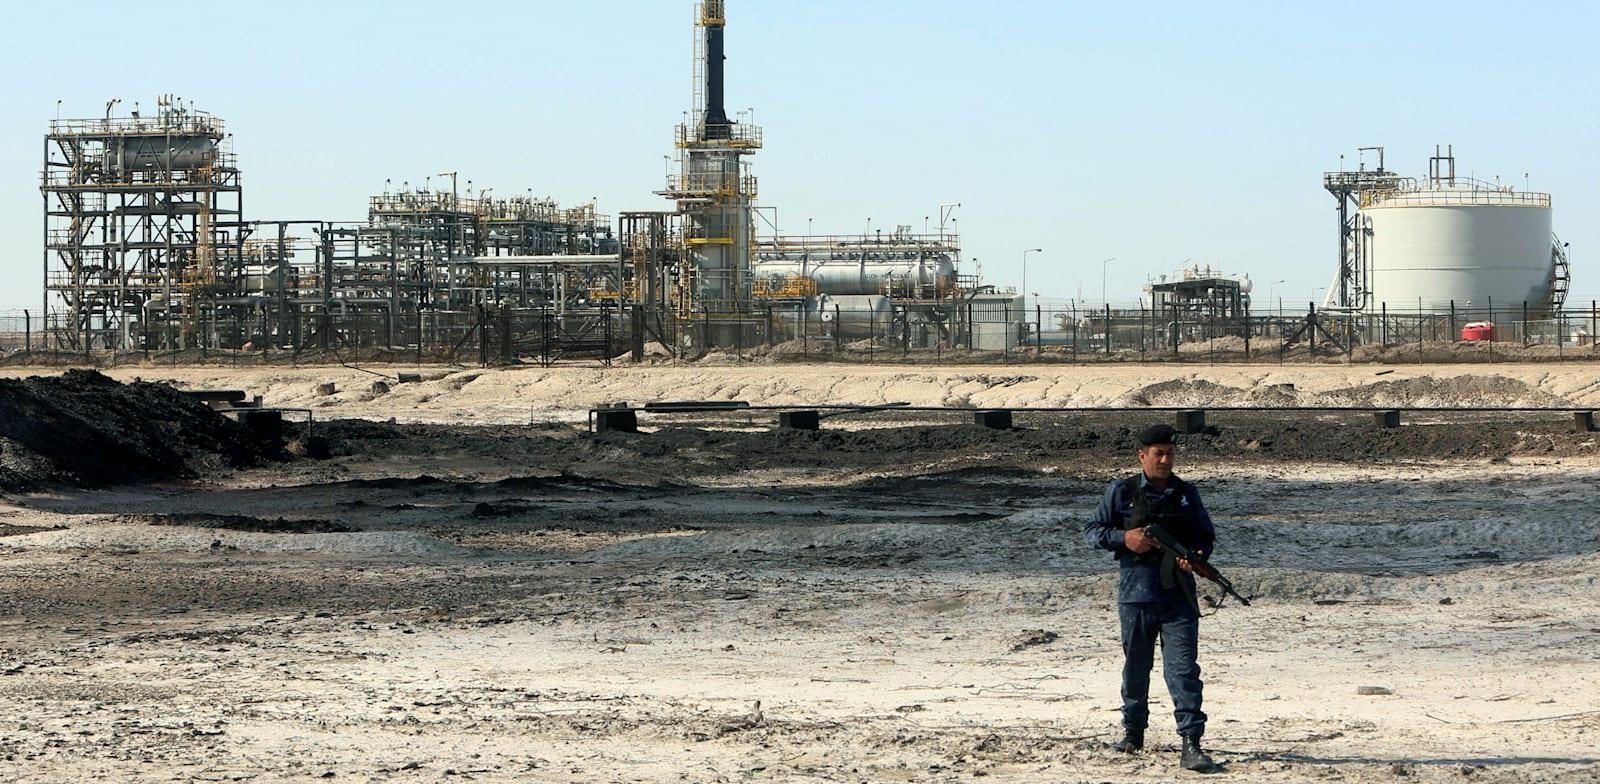 שדה נפט של אקסון בעיראק / צילום: Reuters, Essam al-Sudani